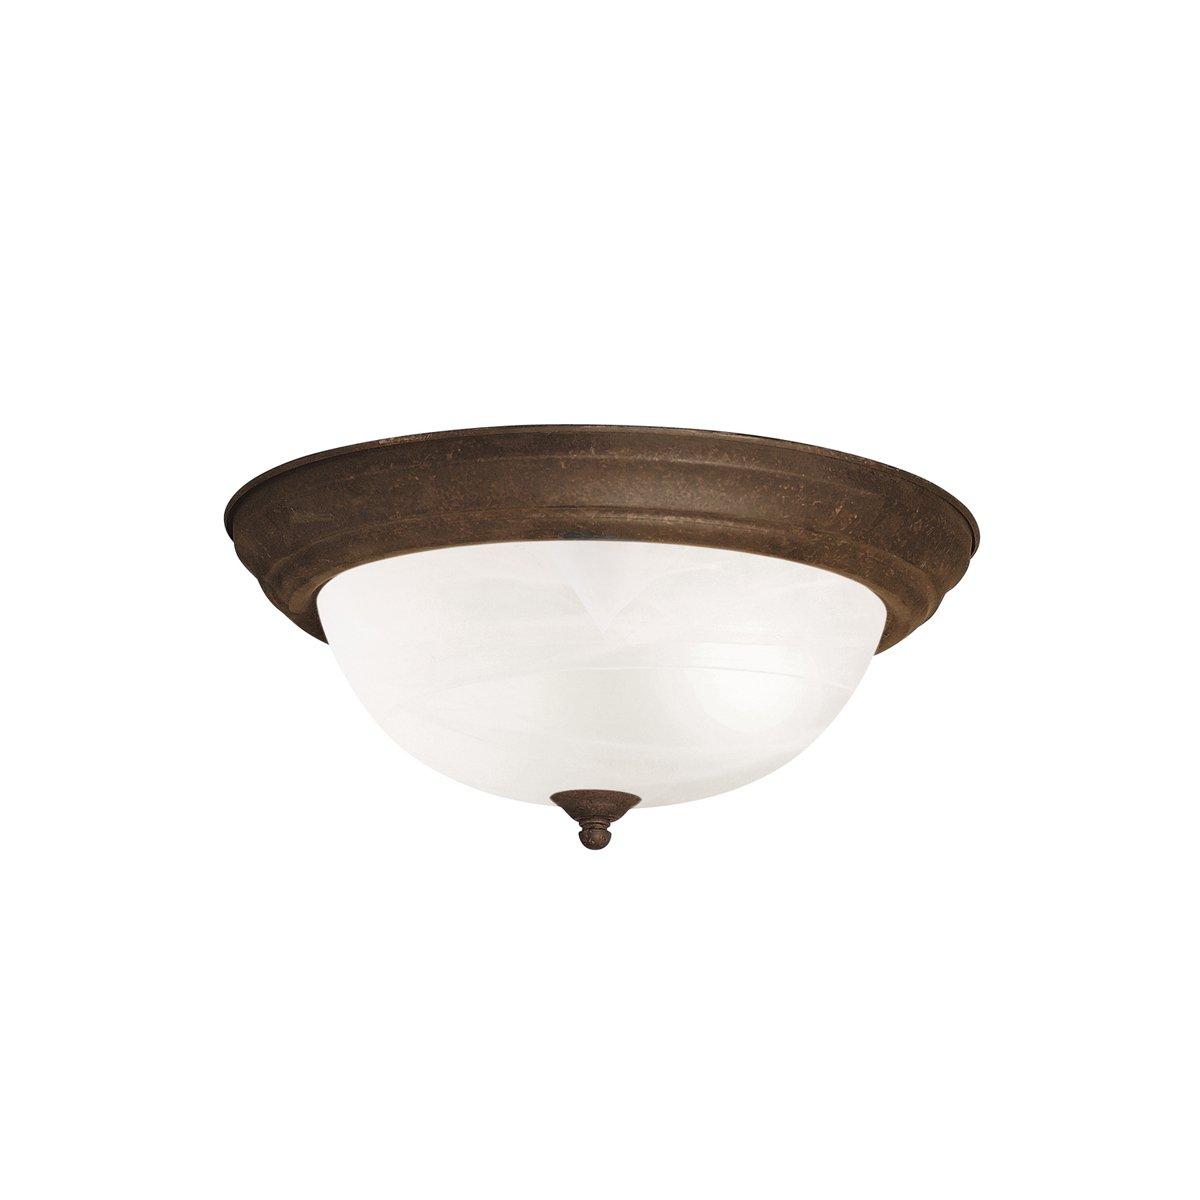 Kichler 8110ni three light flush mount flush mount ceiling light kichler 8110ni three light flush mount flush mount ceiling light fixtures amazon arubaitofo Images